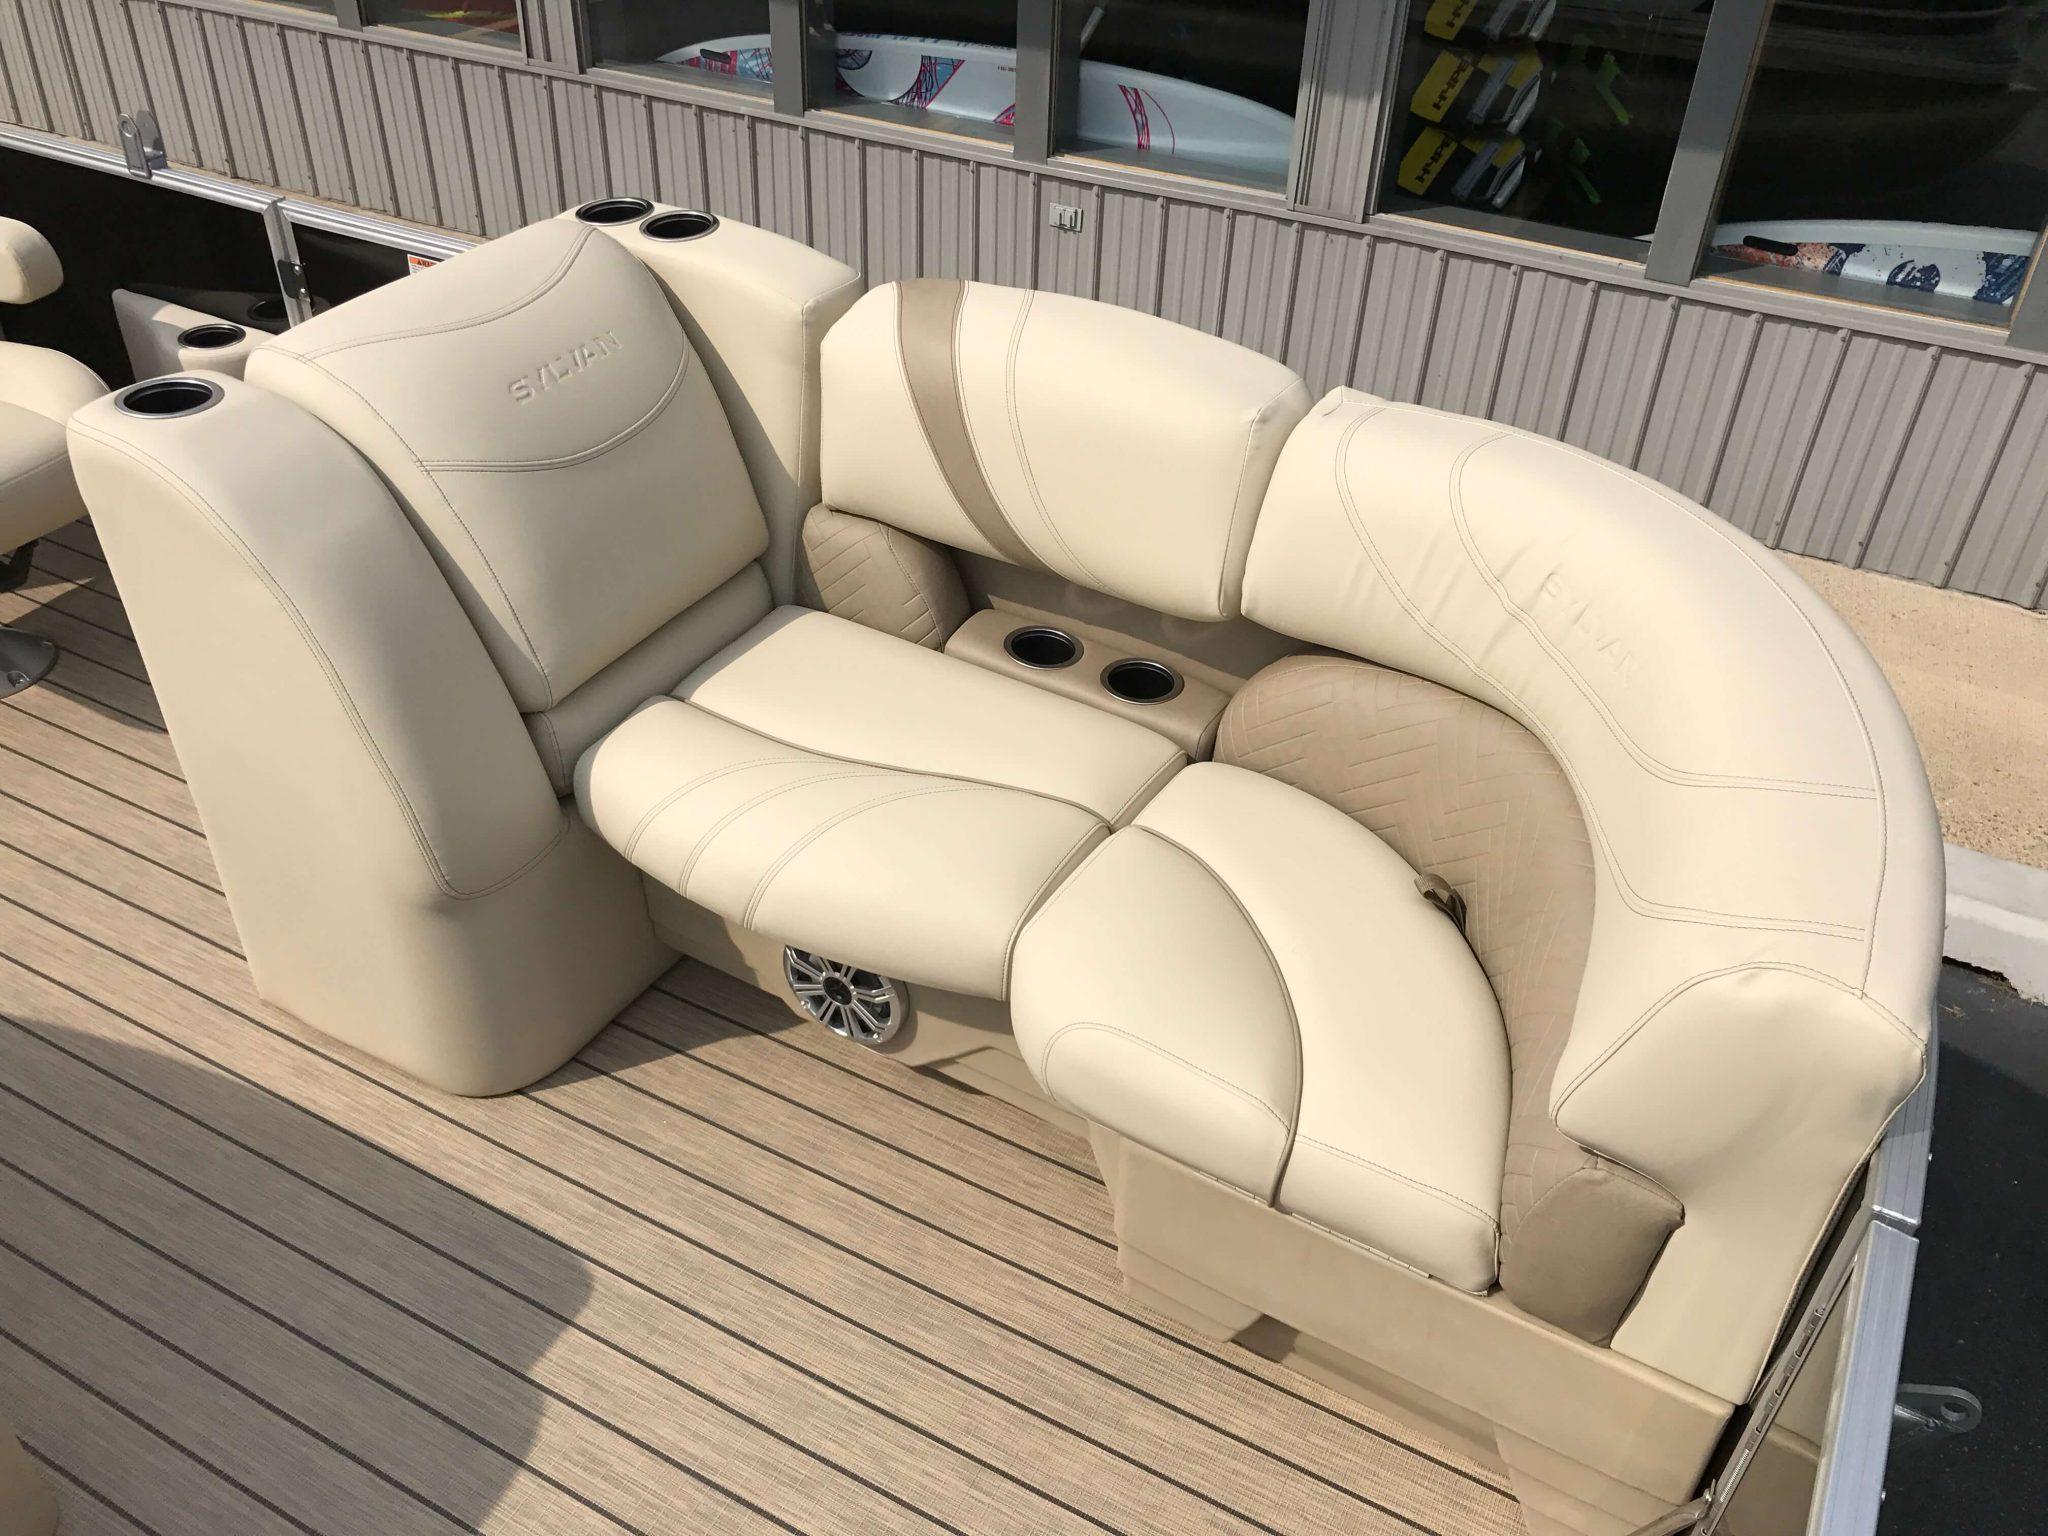 2019 Sylvan 8520 LZ LE Interior LZ Seating 3